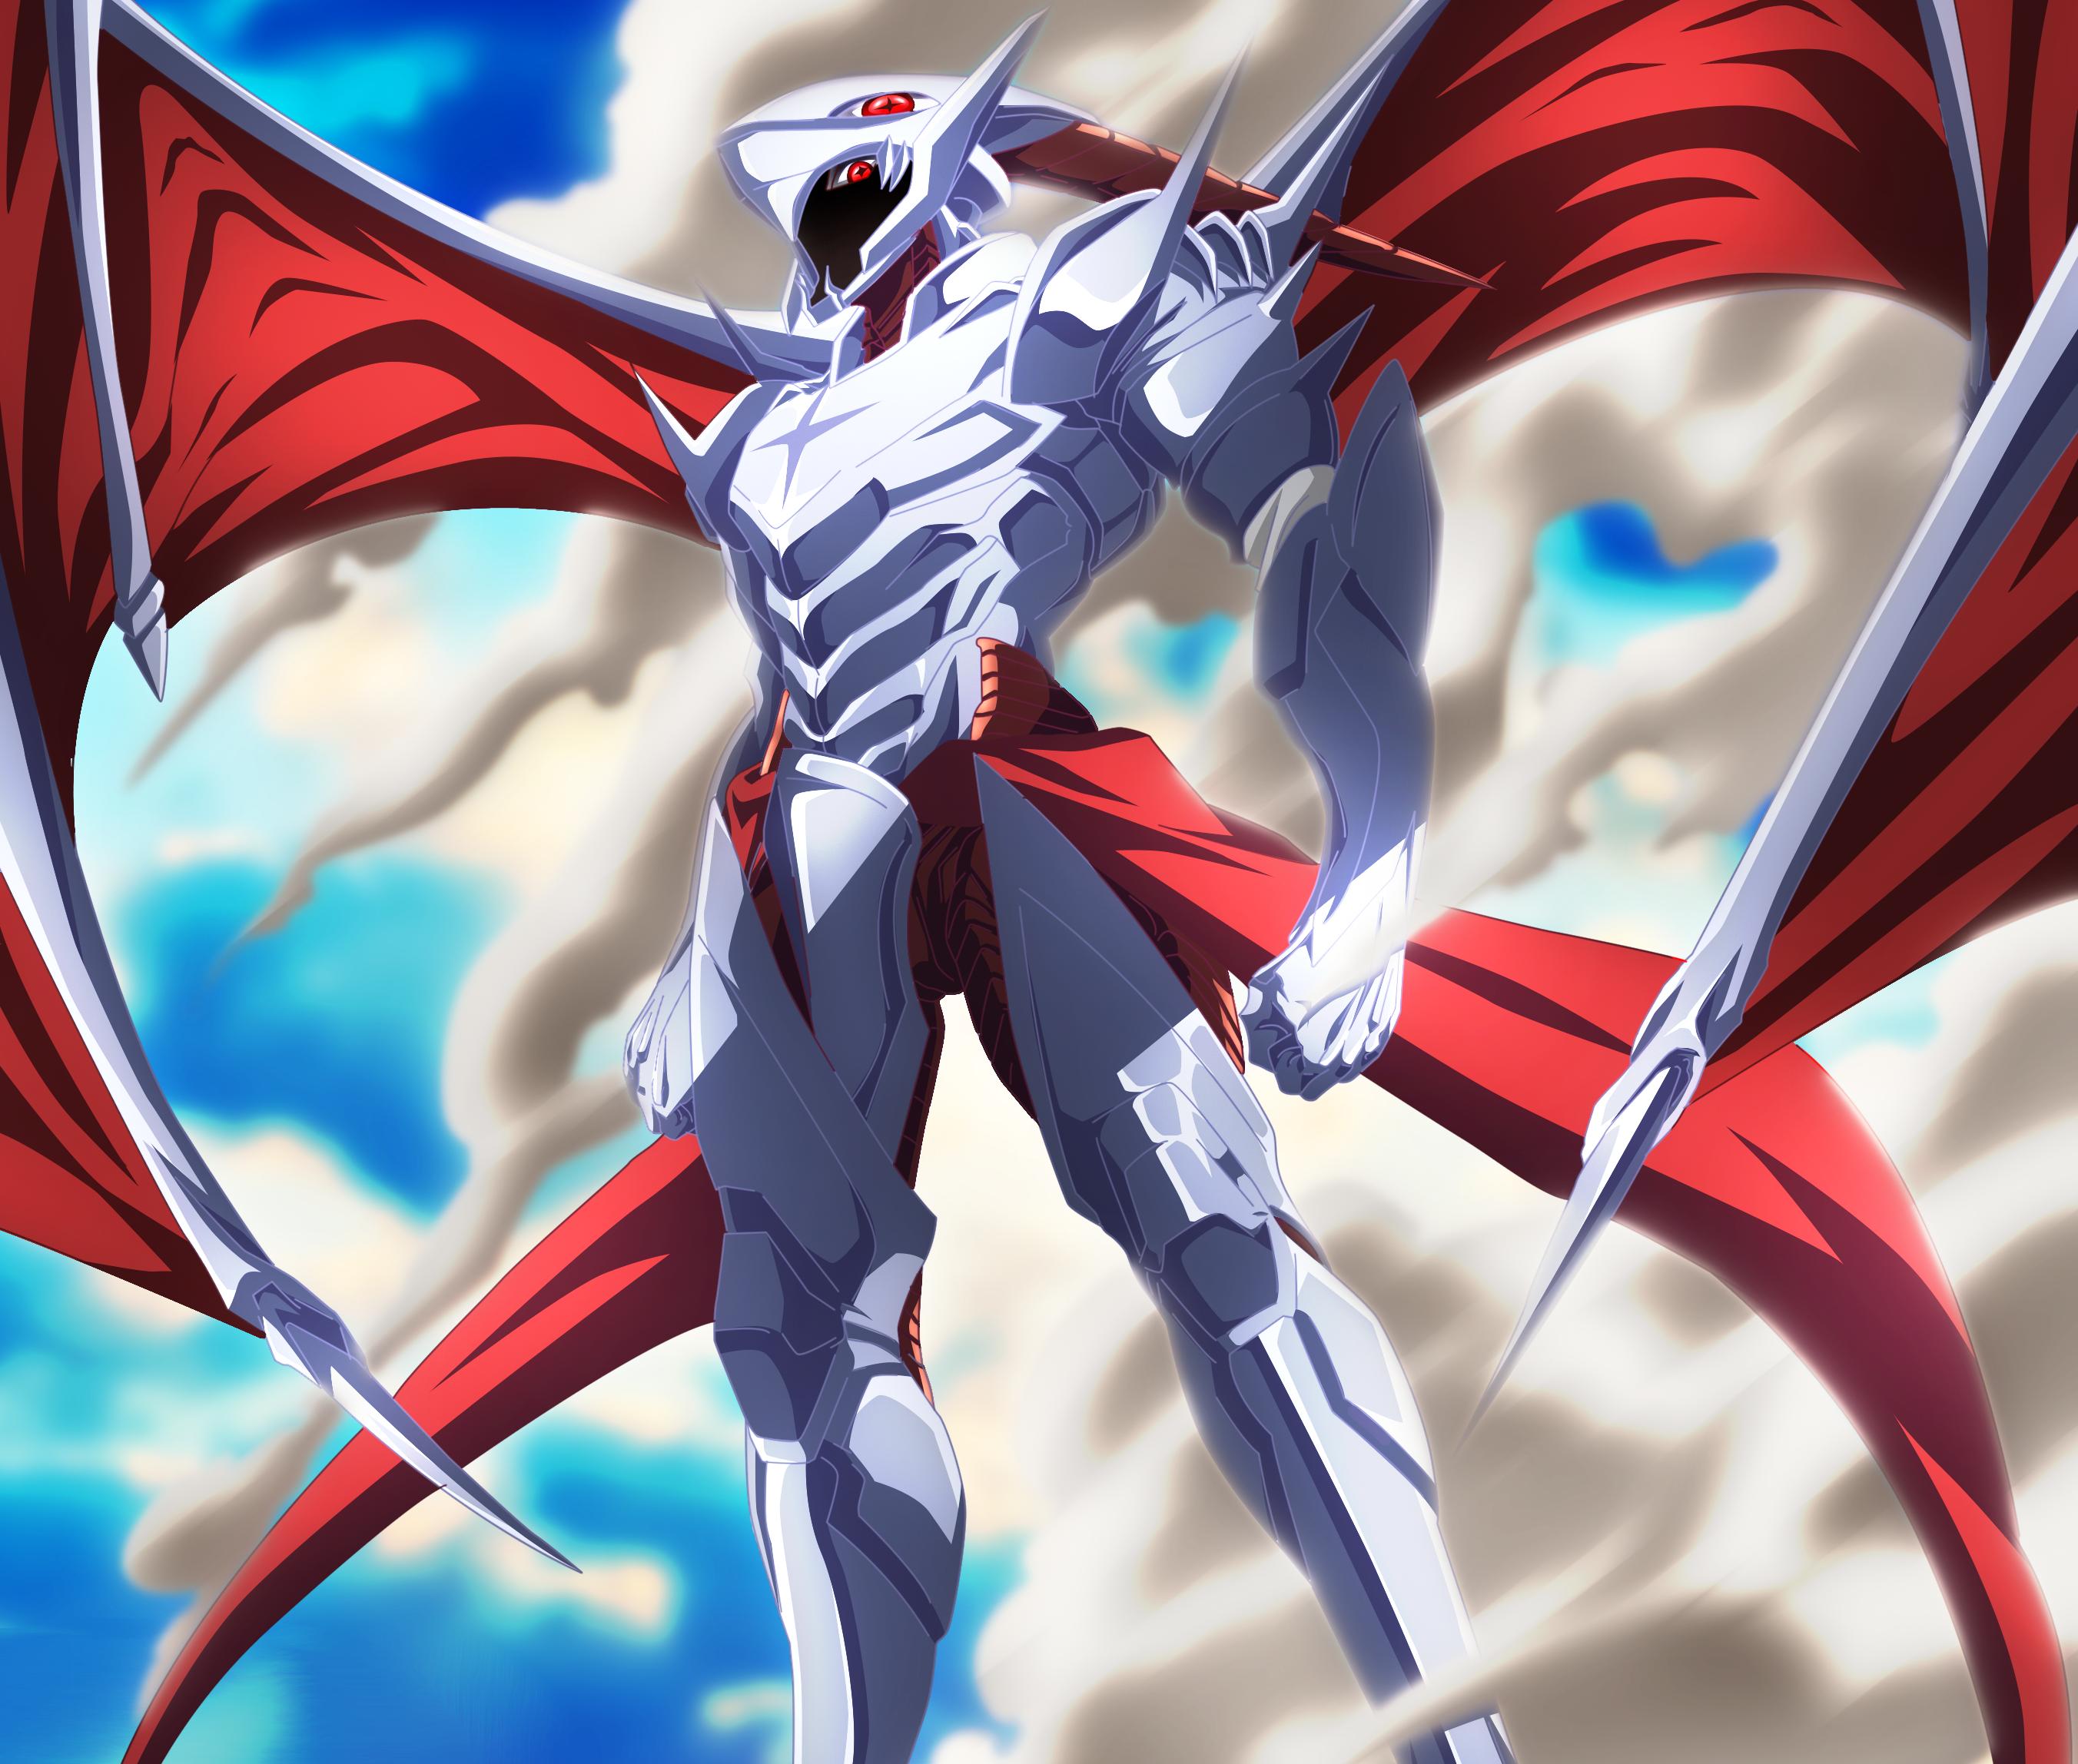 Akame Ga Kill Hd Wallpaper Background Image 2704x2296 Id